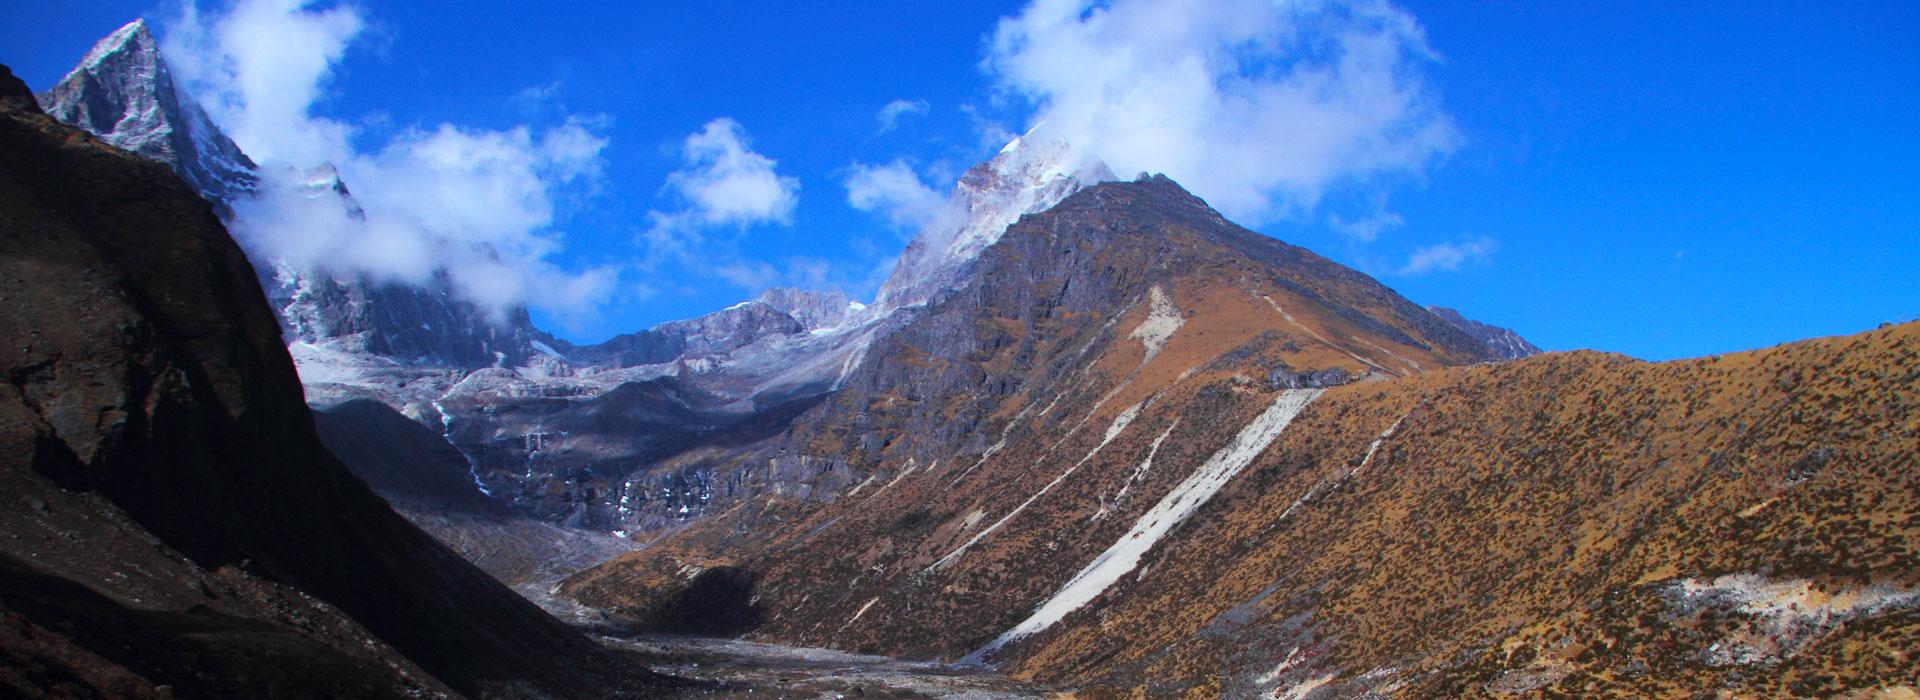 Everest Base Camp Kalapathar Trek